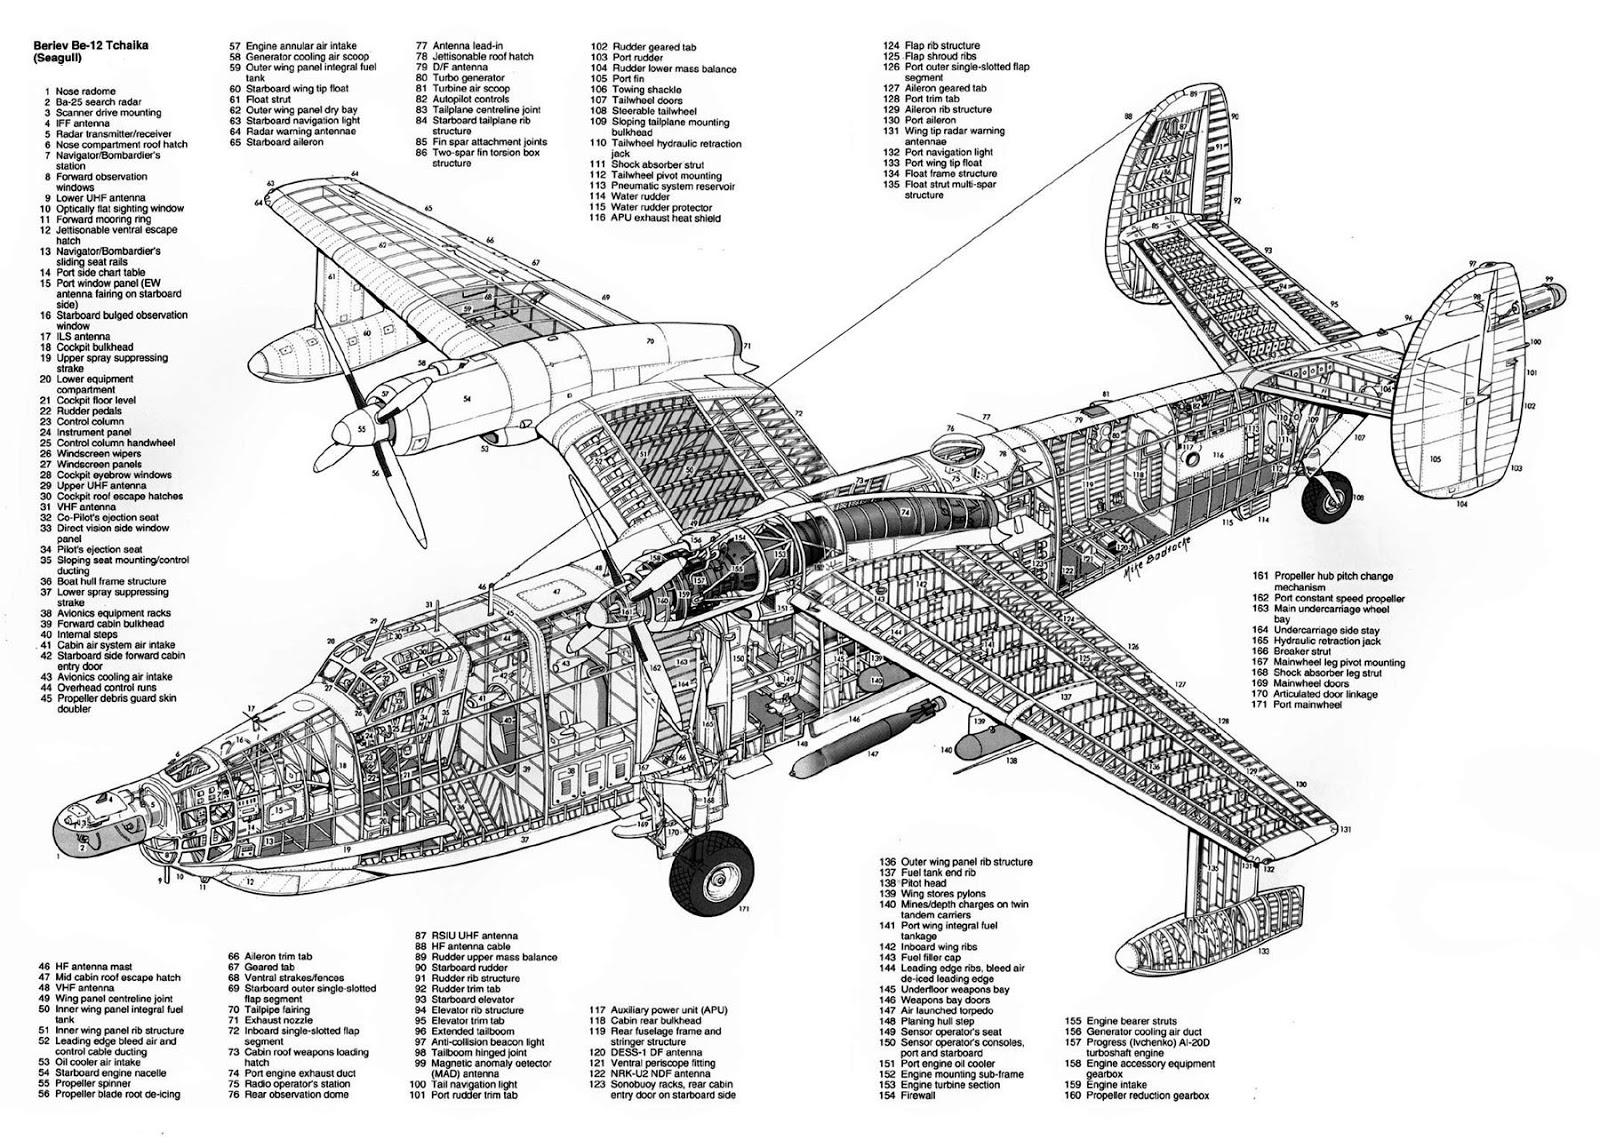 Aerosngcanela Hidroaviao Beriev Be 12